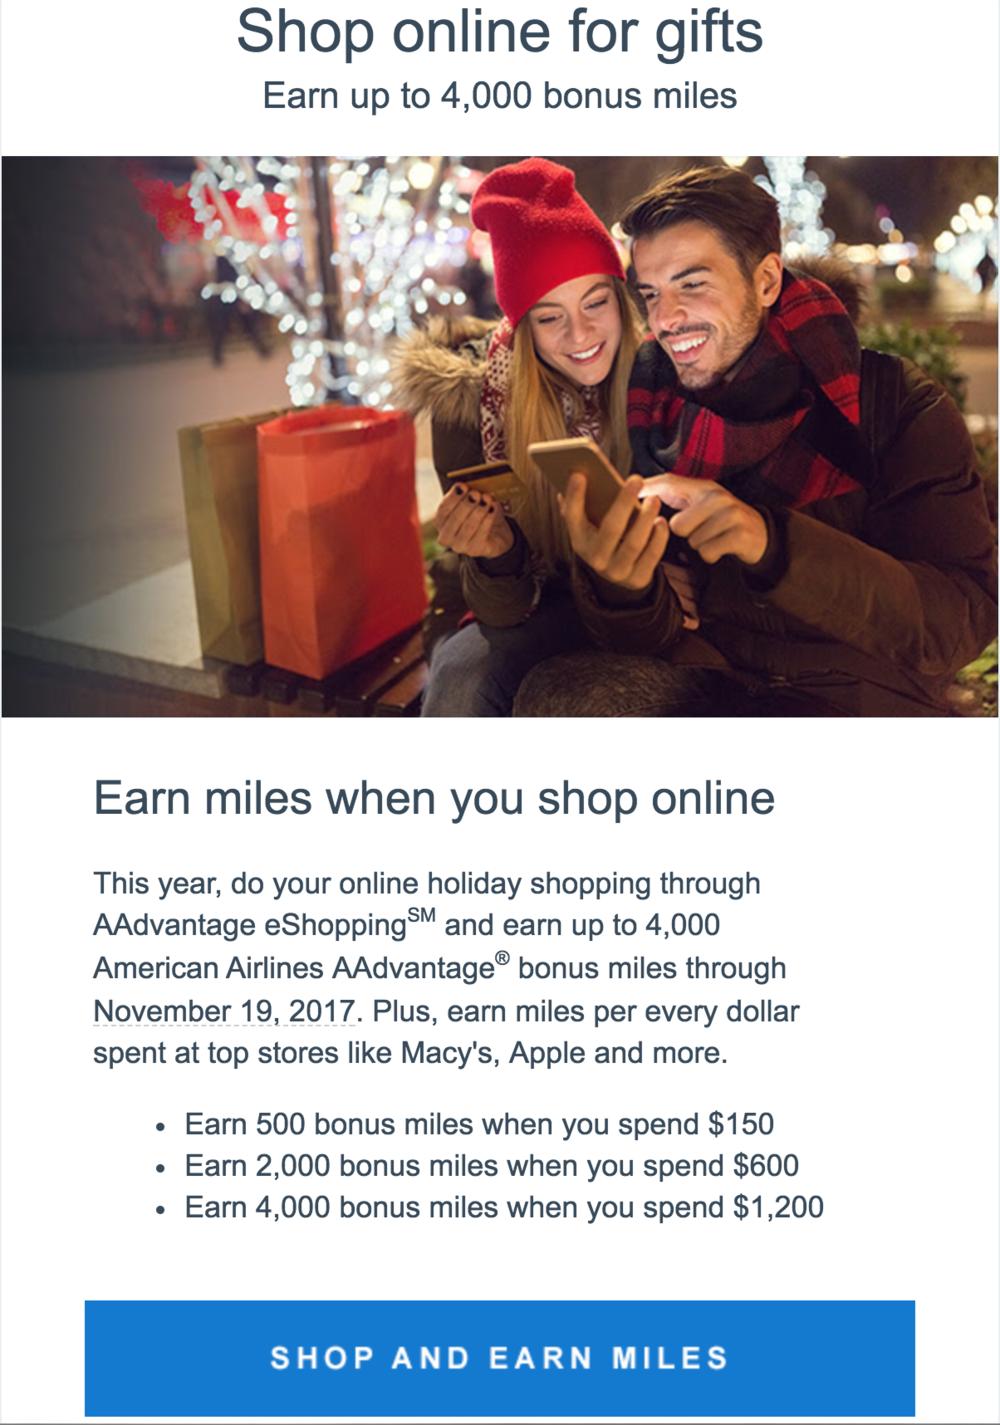 AAdvantage eShopping Christmas 2017 promotion  (click to enlarge)